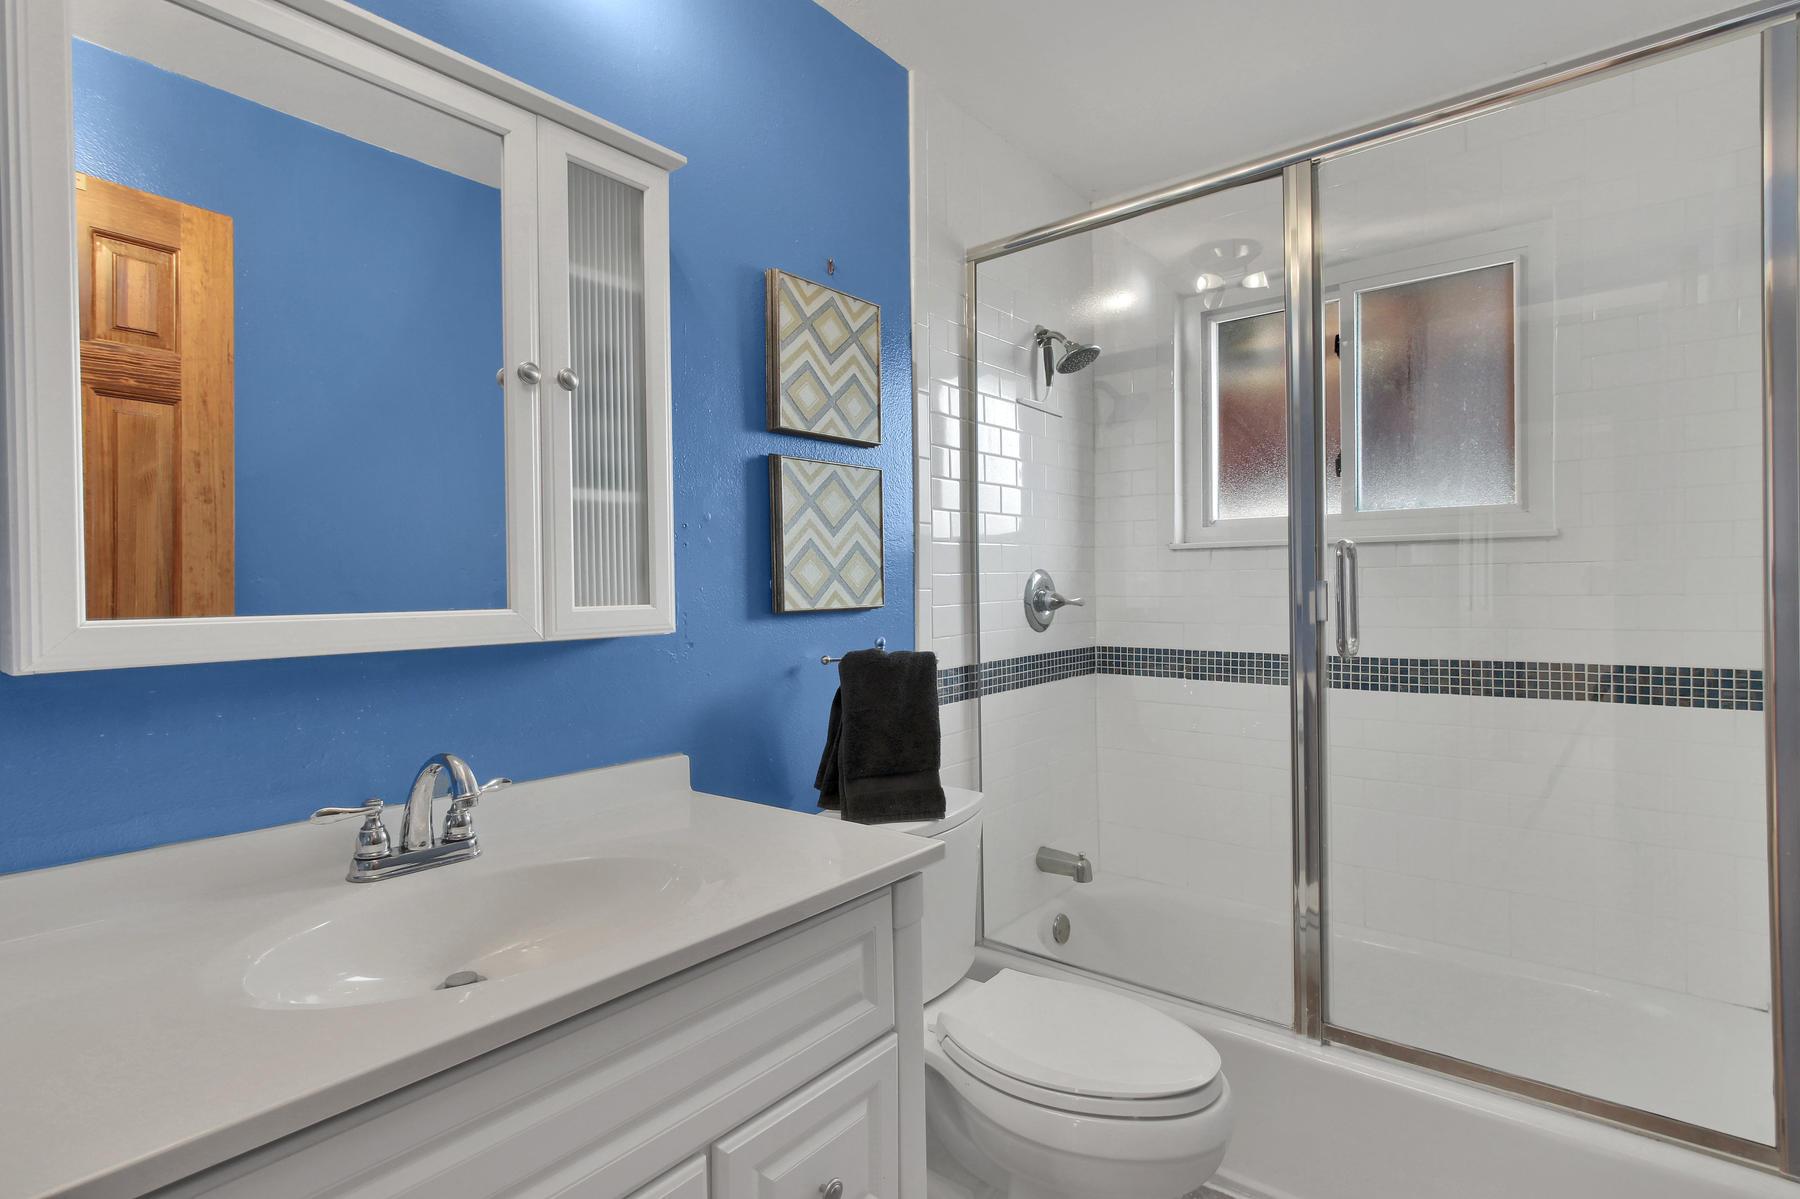 9375 Osceola St Westminster CO-014-21-Bathroom-MLS_Size.jpg